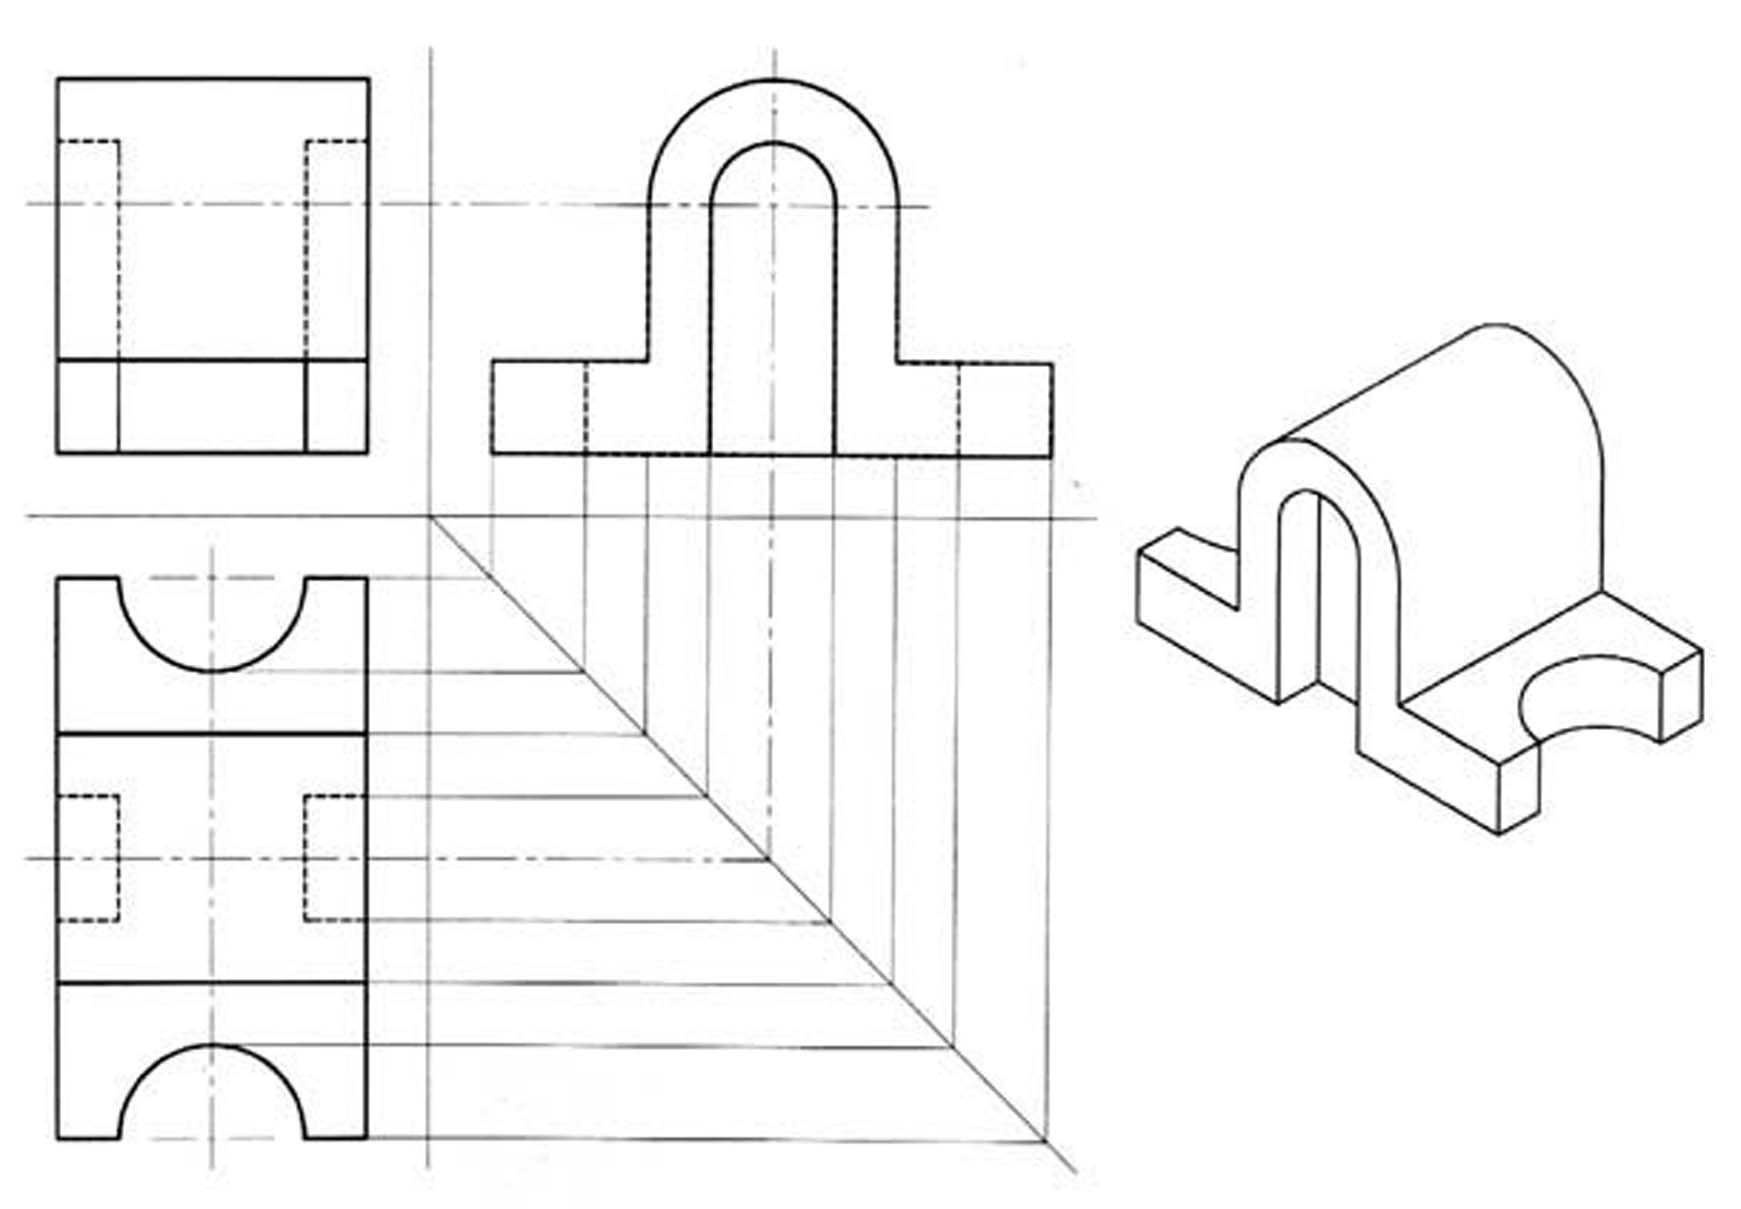 Edfbbe63b32ba679a13f3dfa57727a35 Jpg 1741 1209 Isometric Drawing Exercises Isometric Drawing Drawing Exercises